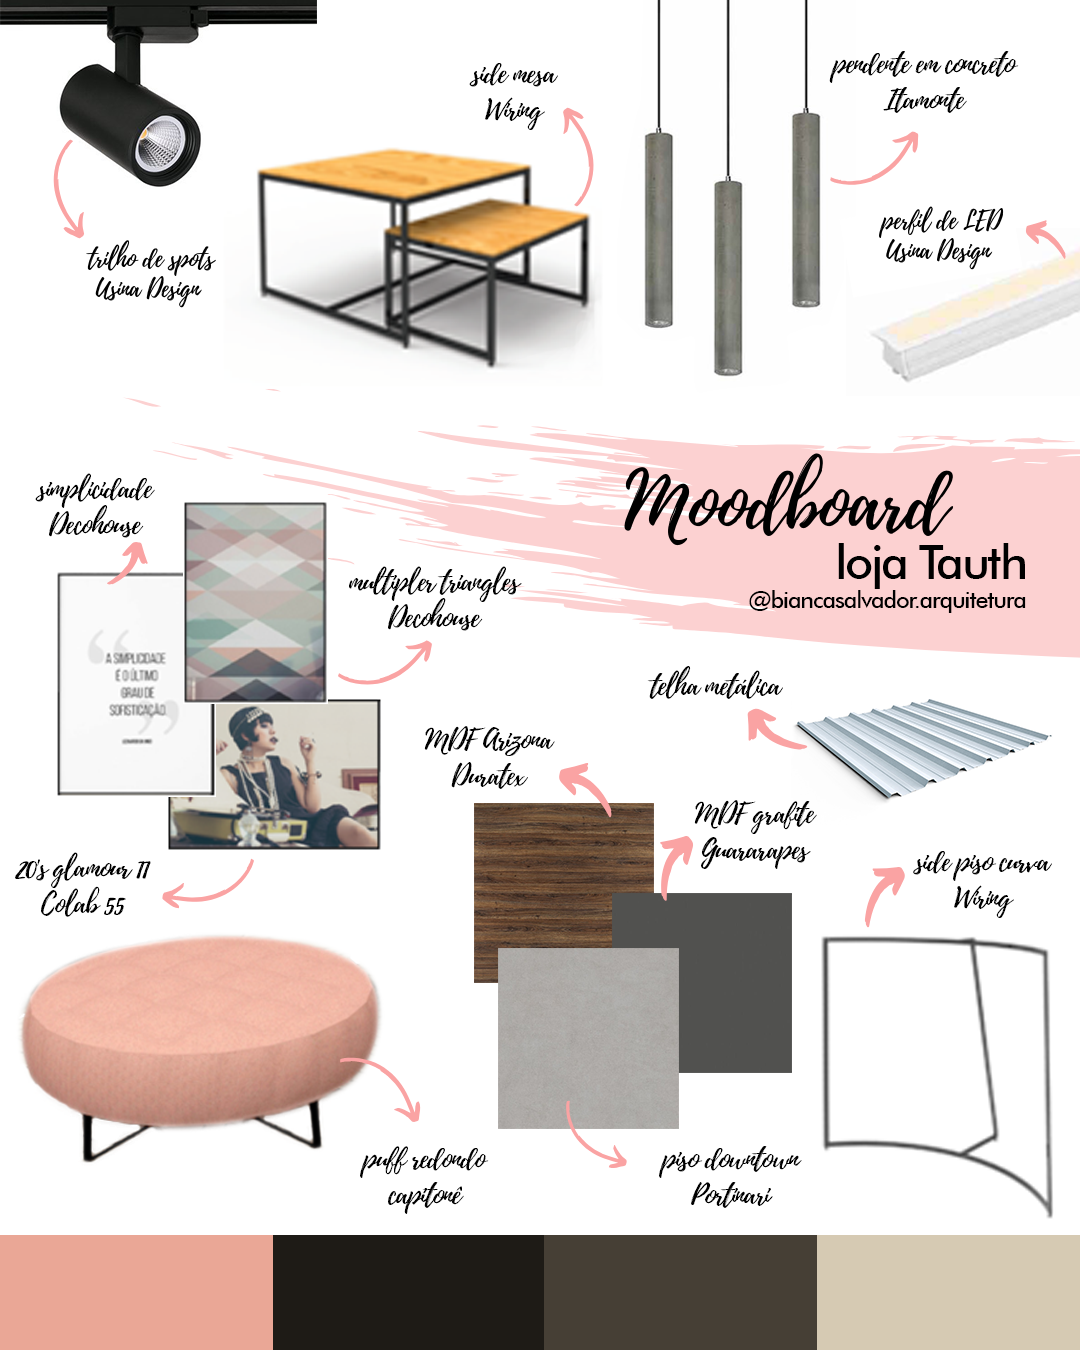 Moodboard Loja Tauth Loja De Design De Interiores Escritorios De Design De Interiores Interiores Comerciais